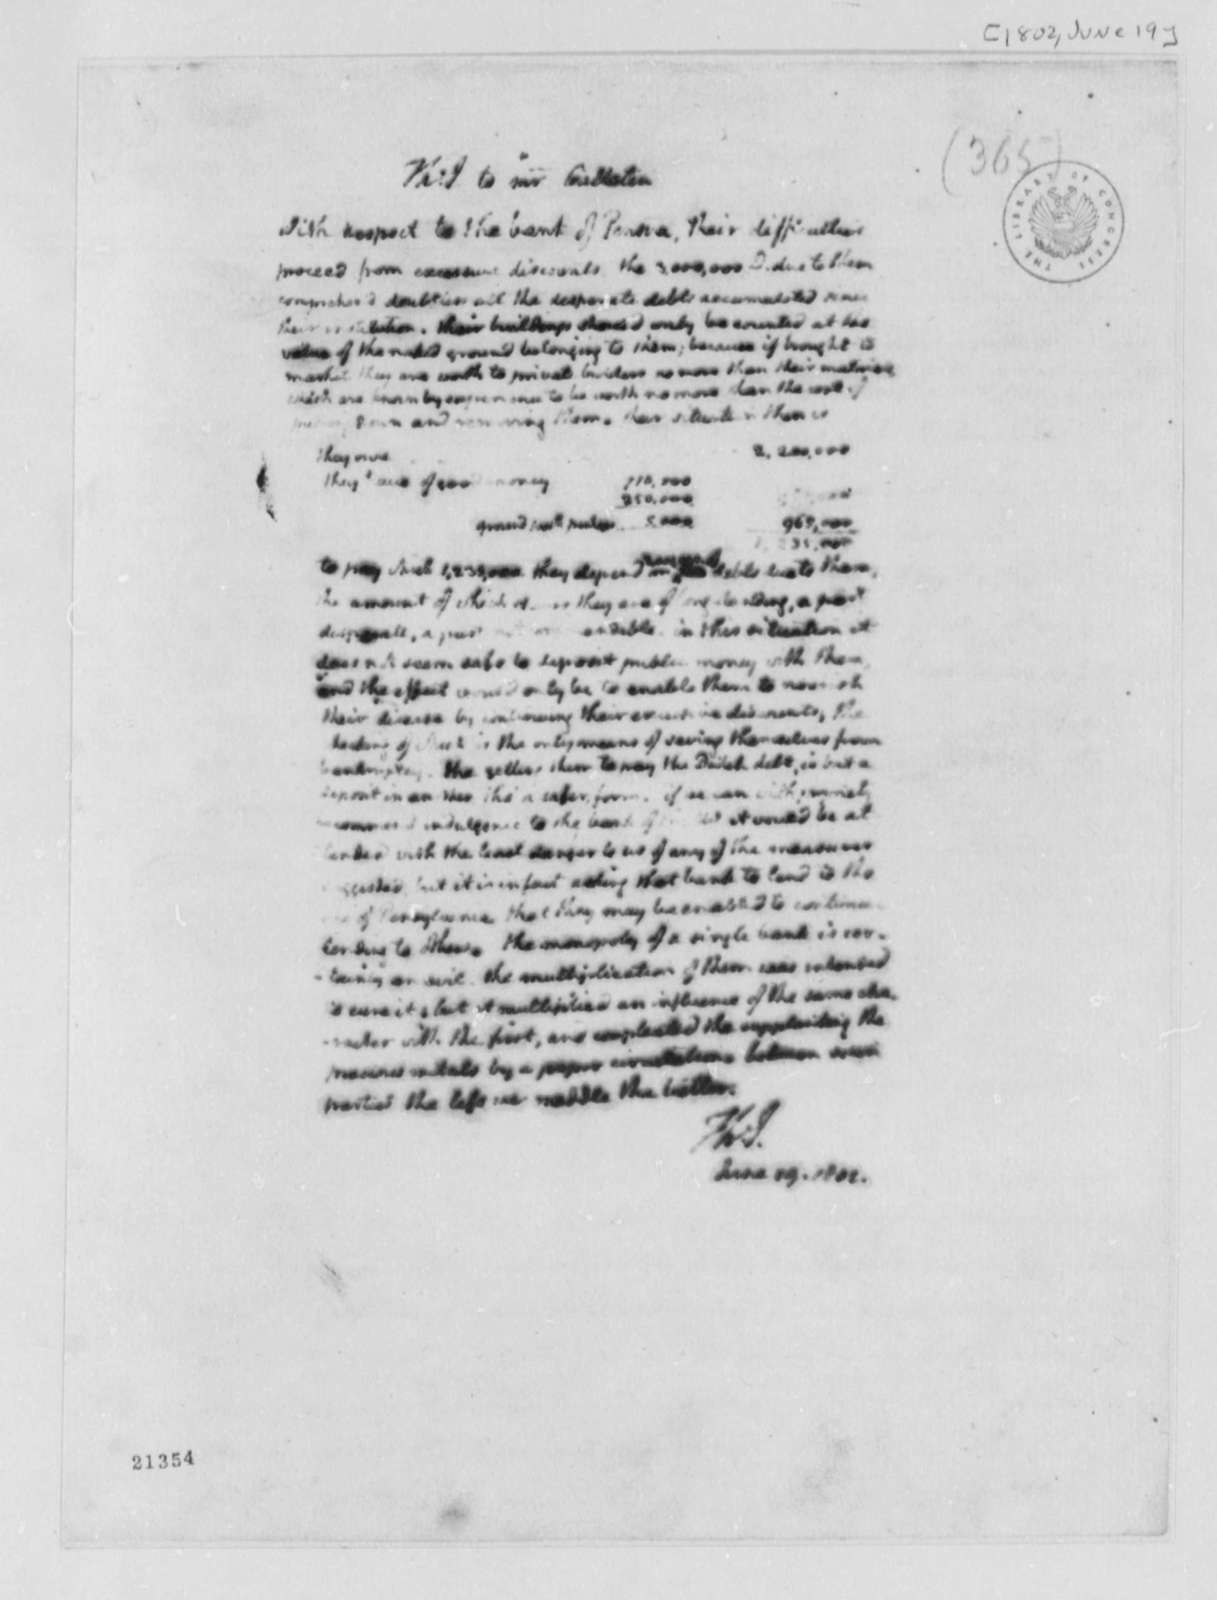 Thomas Jefferson to Albert Gallatin, June 19, 1802